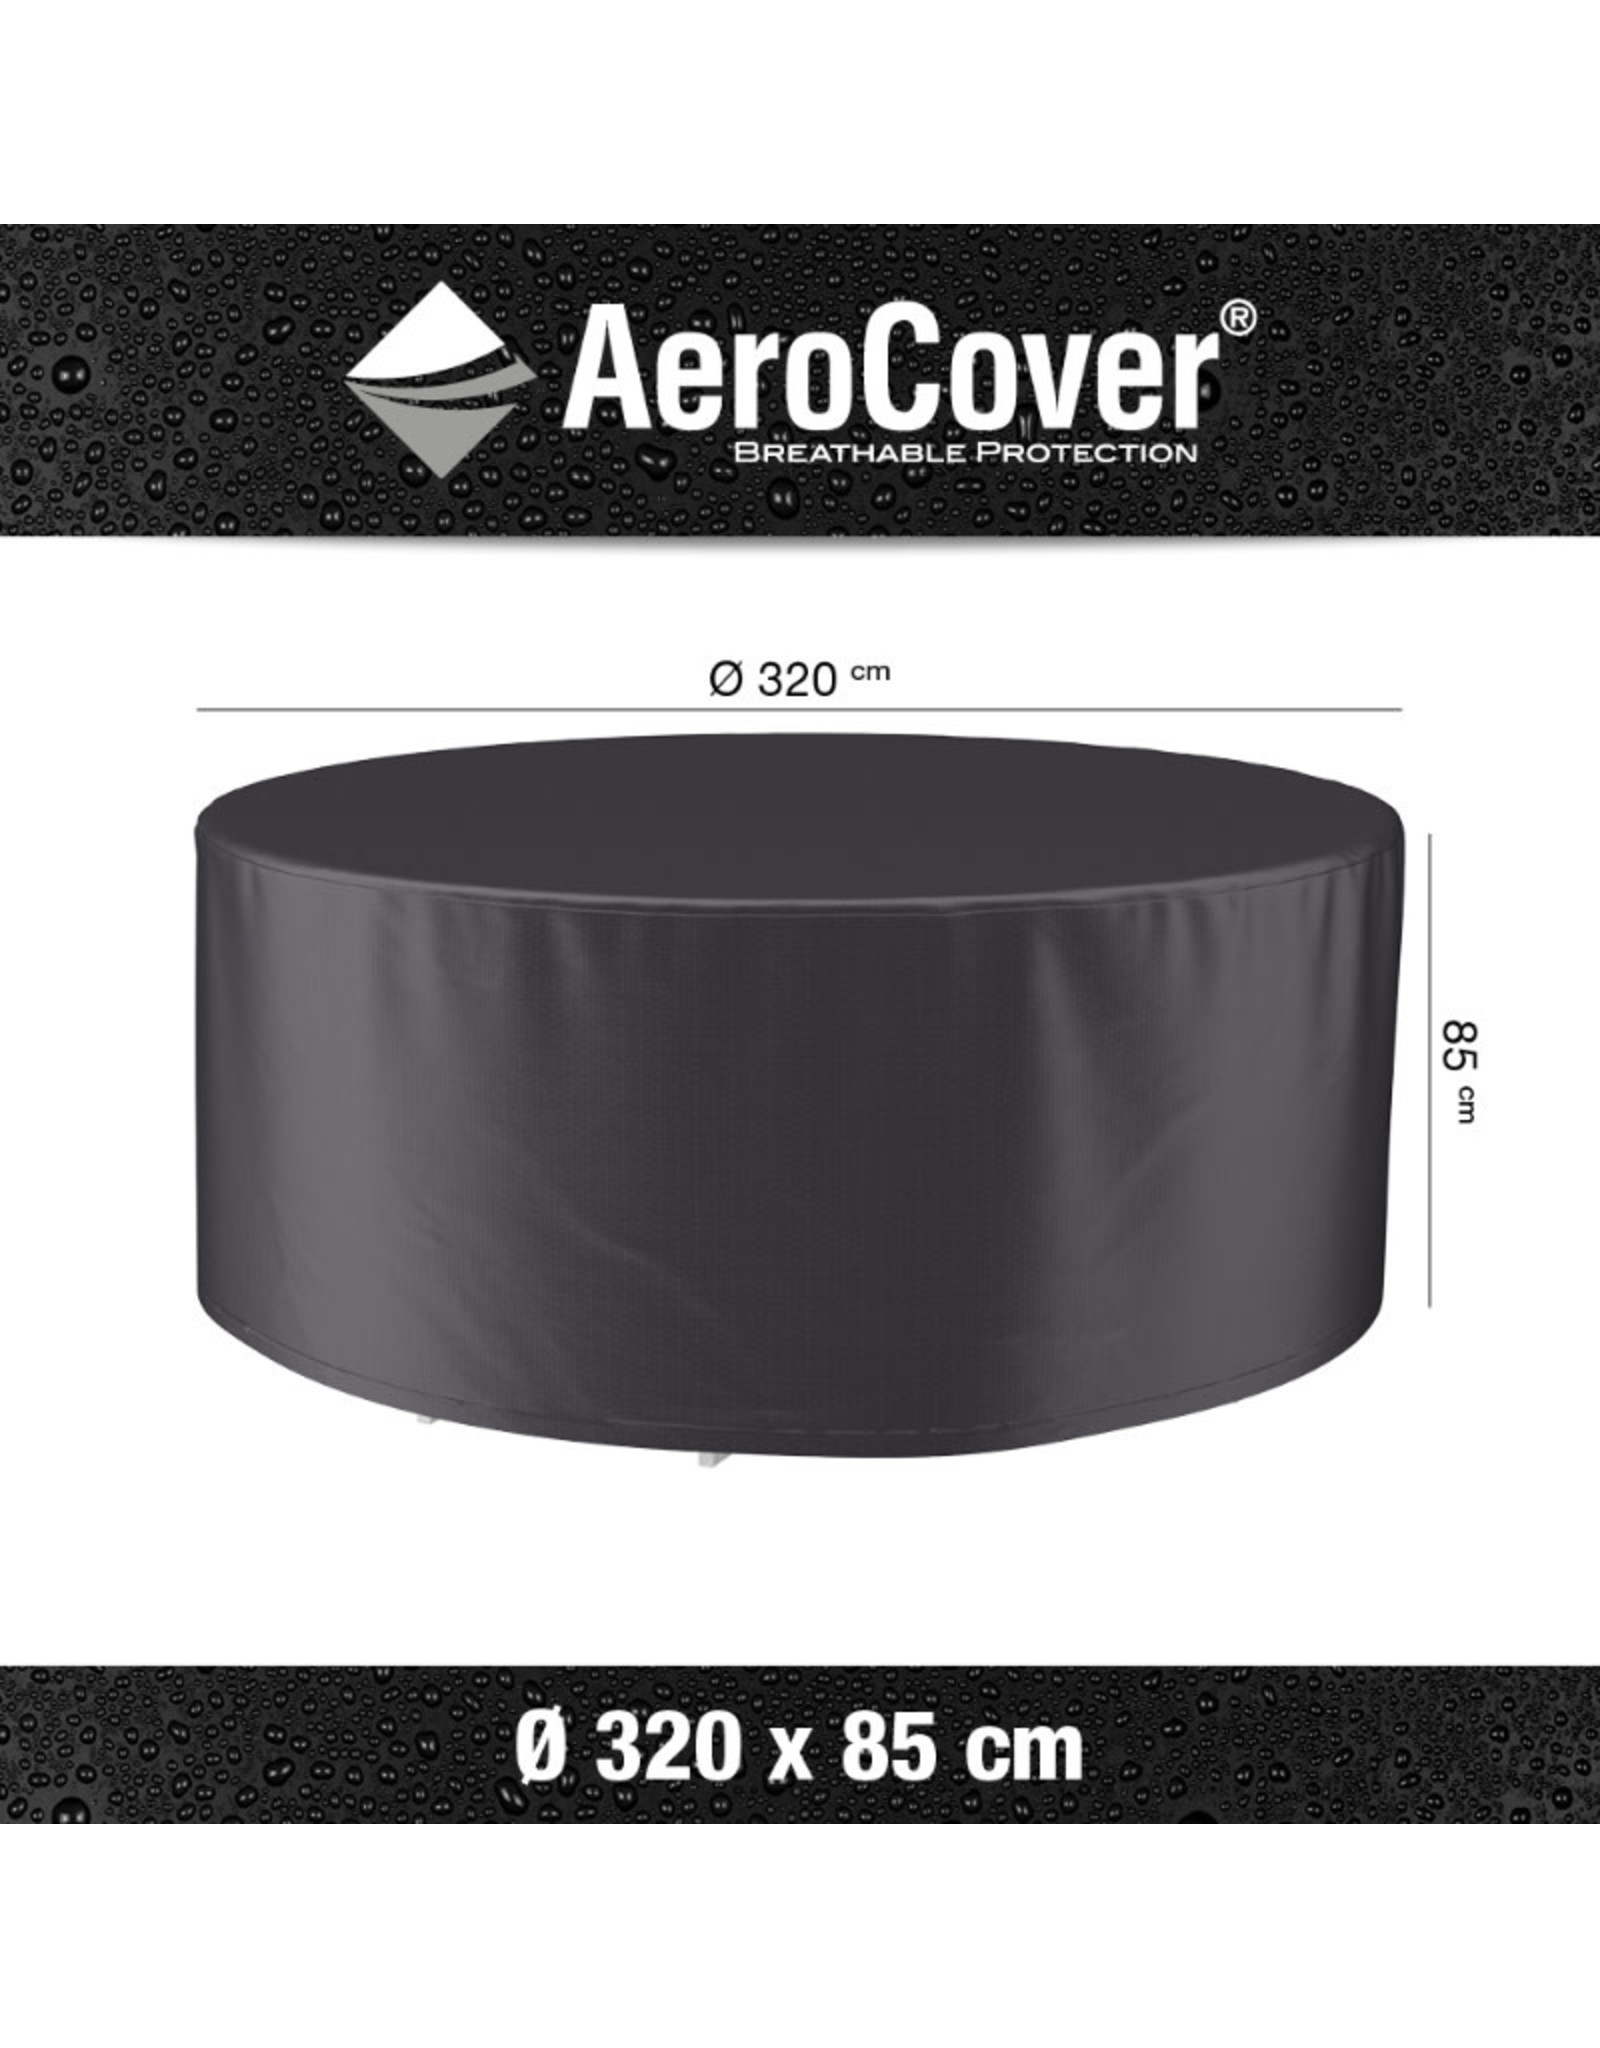 Aerocover Aerocover cover 320xH85cm around